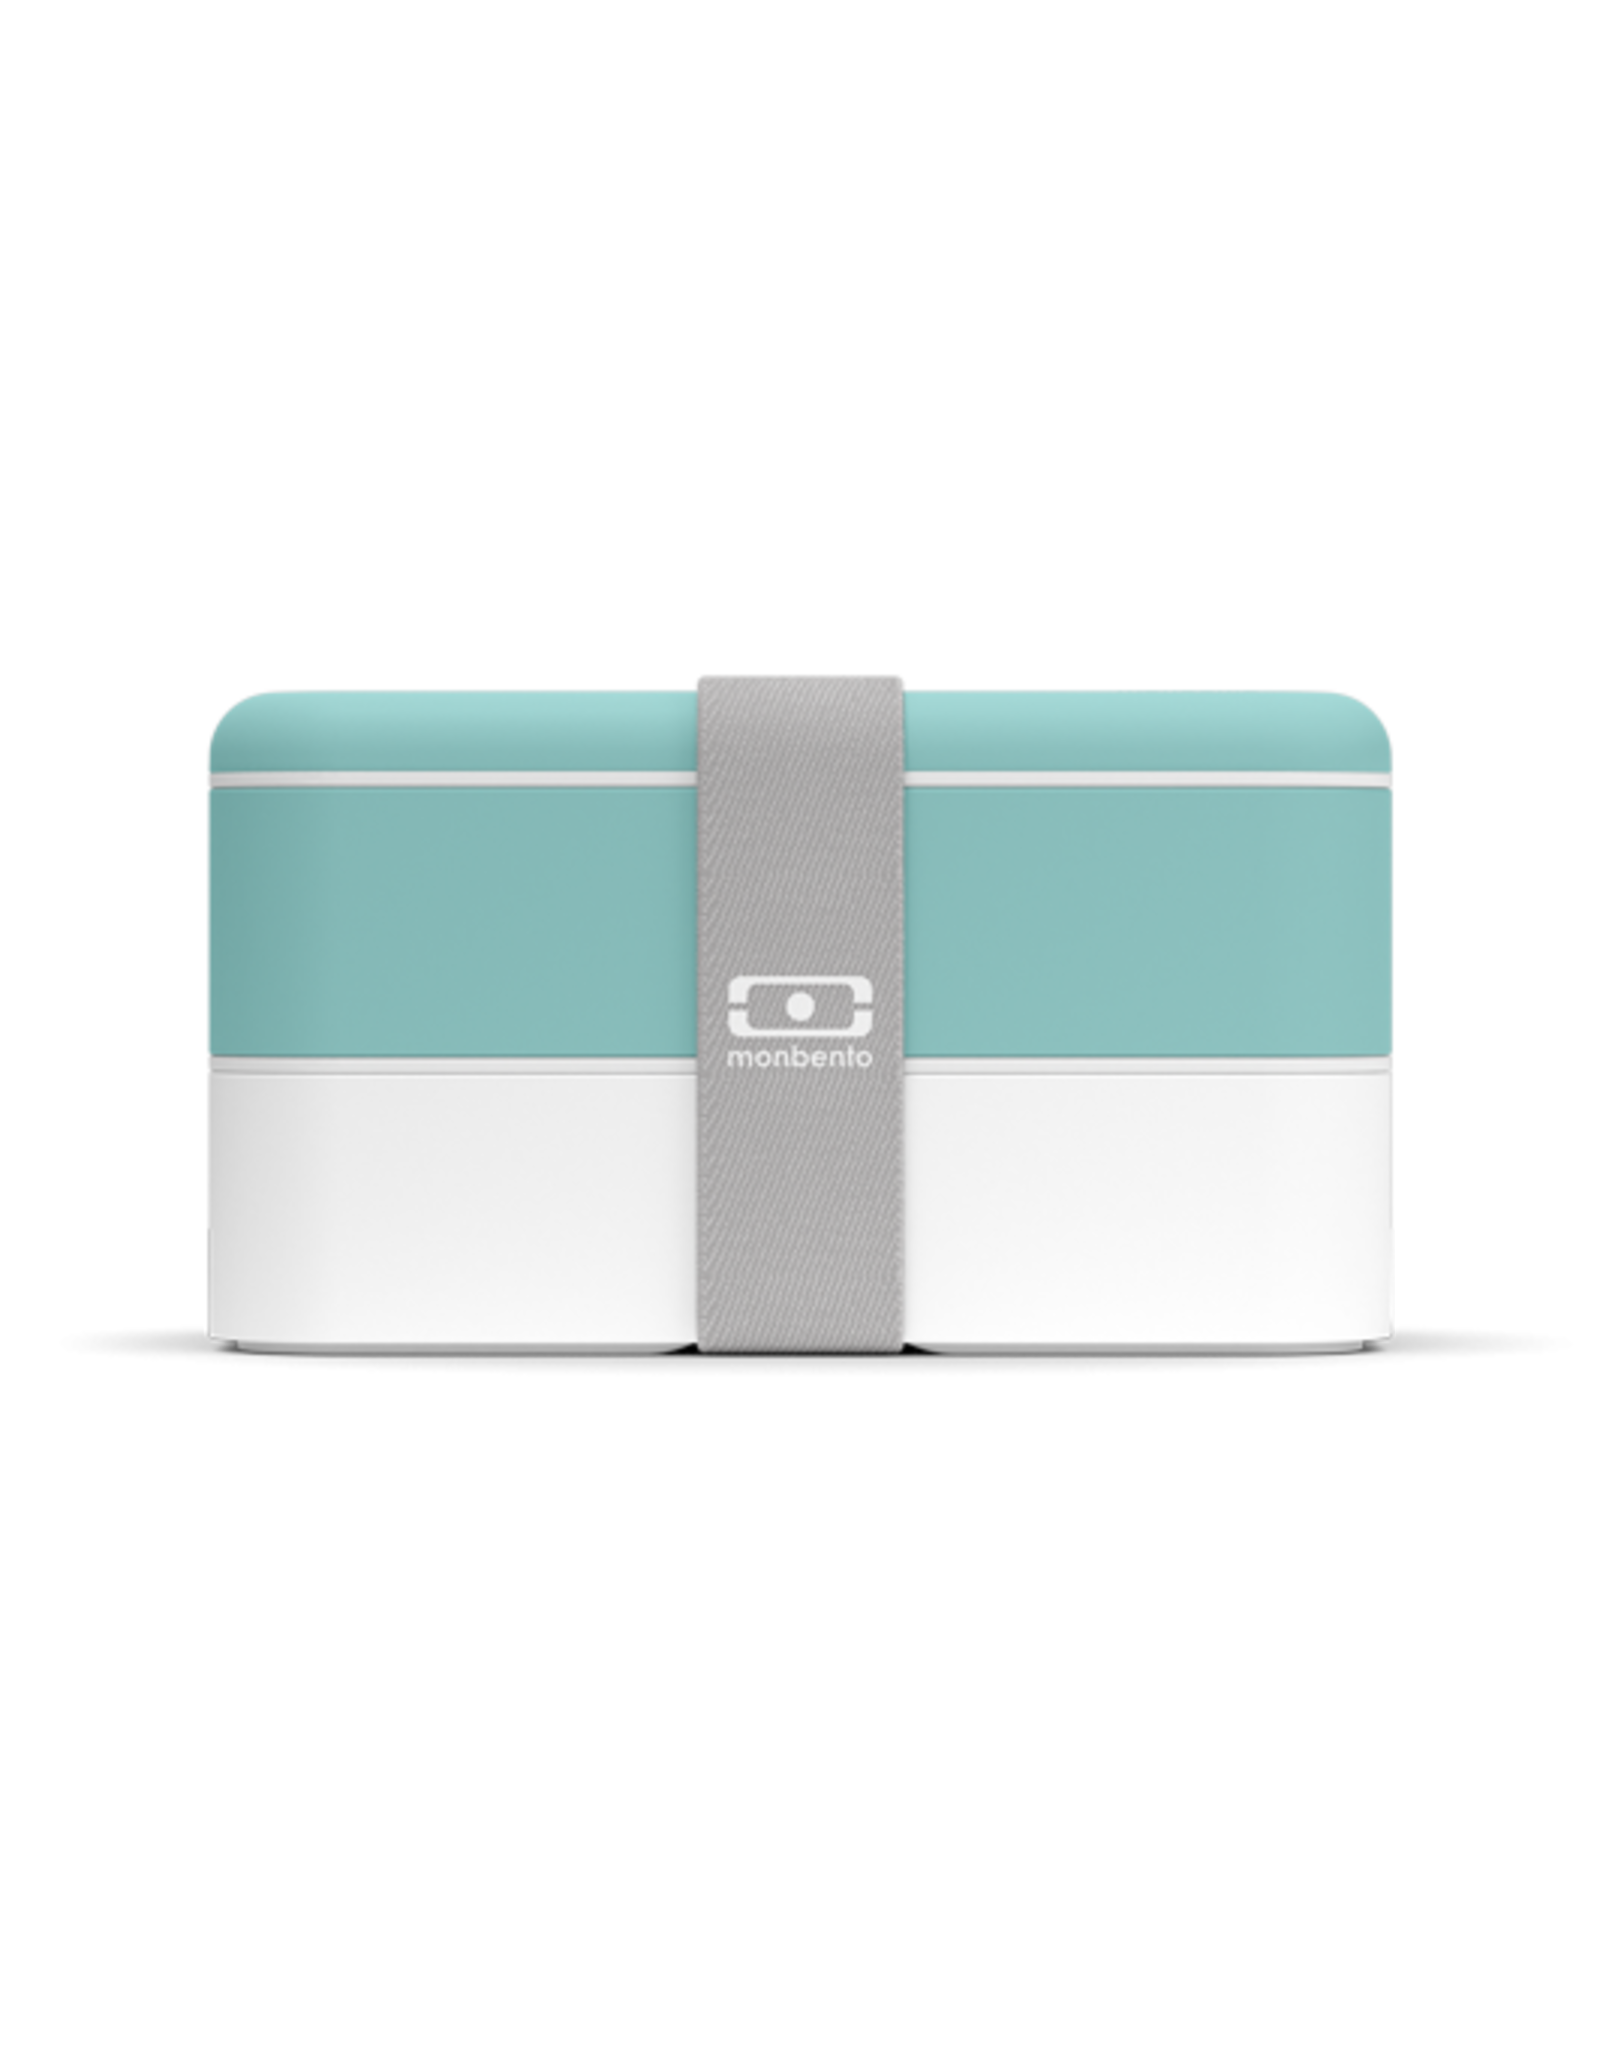 Mon Bento Boîte Bento - MB Original - Vert lagon